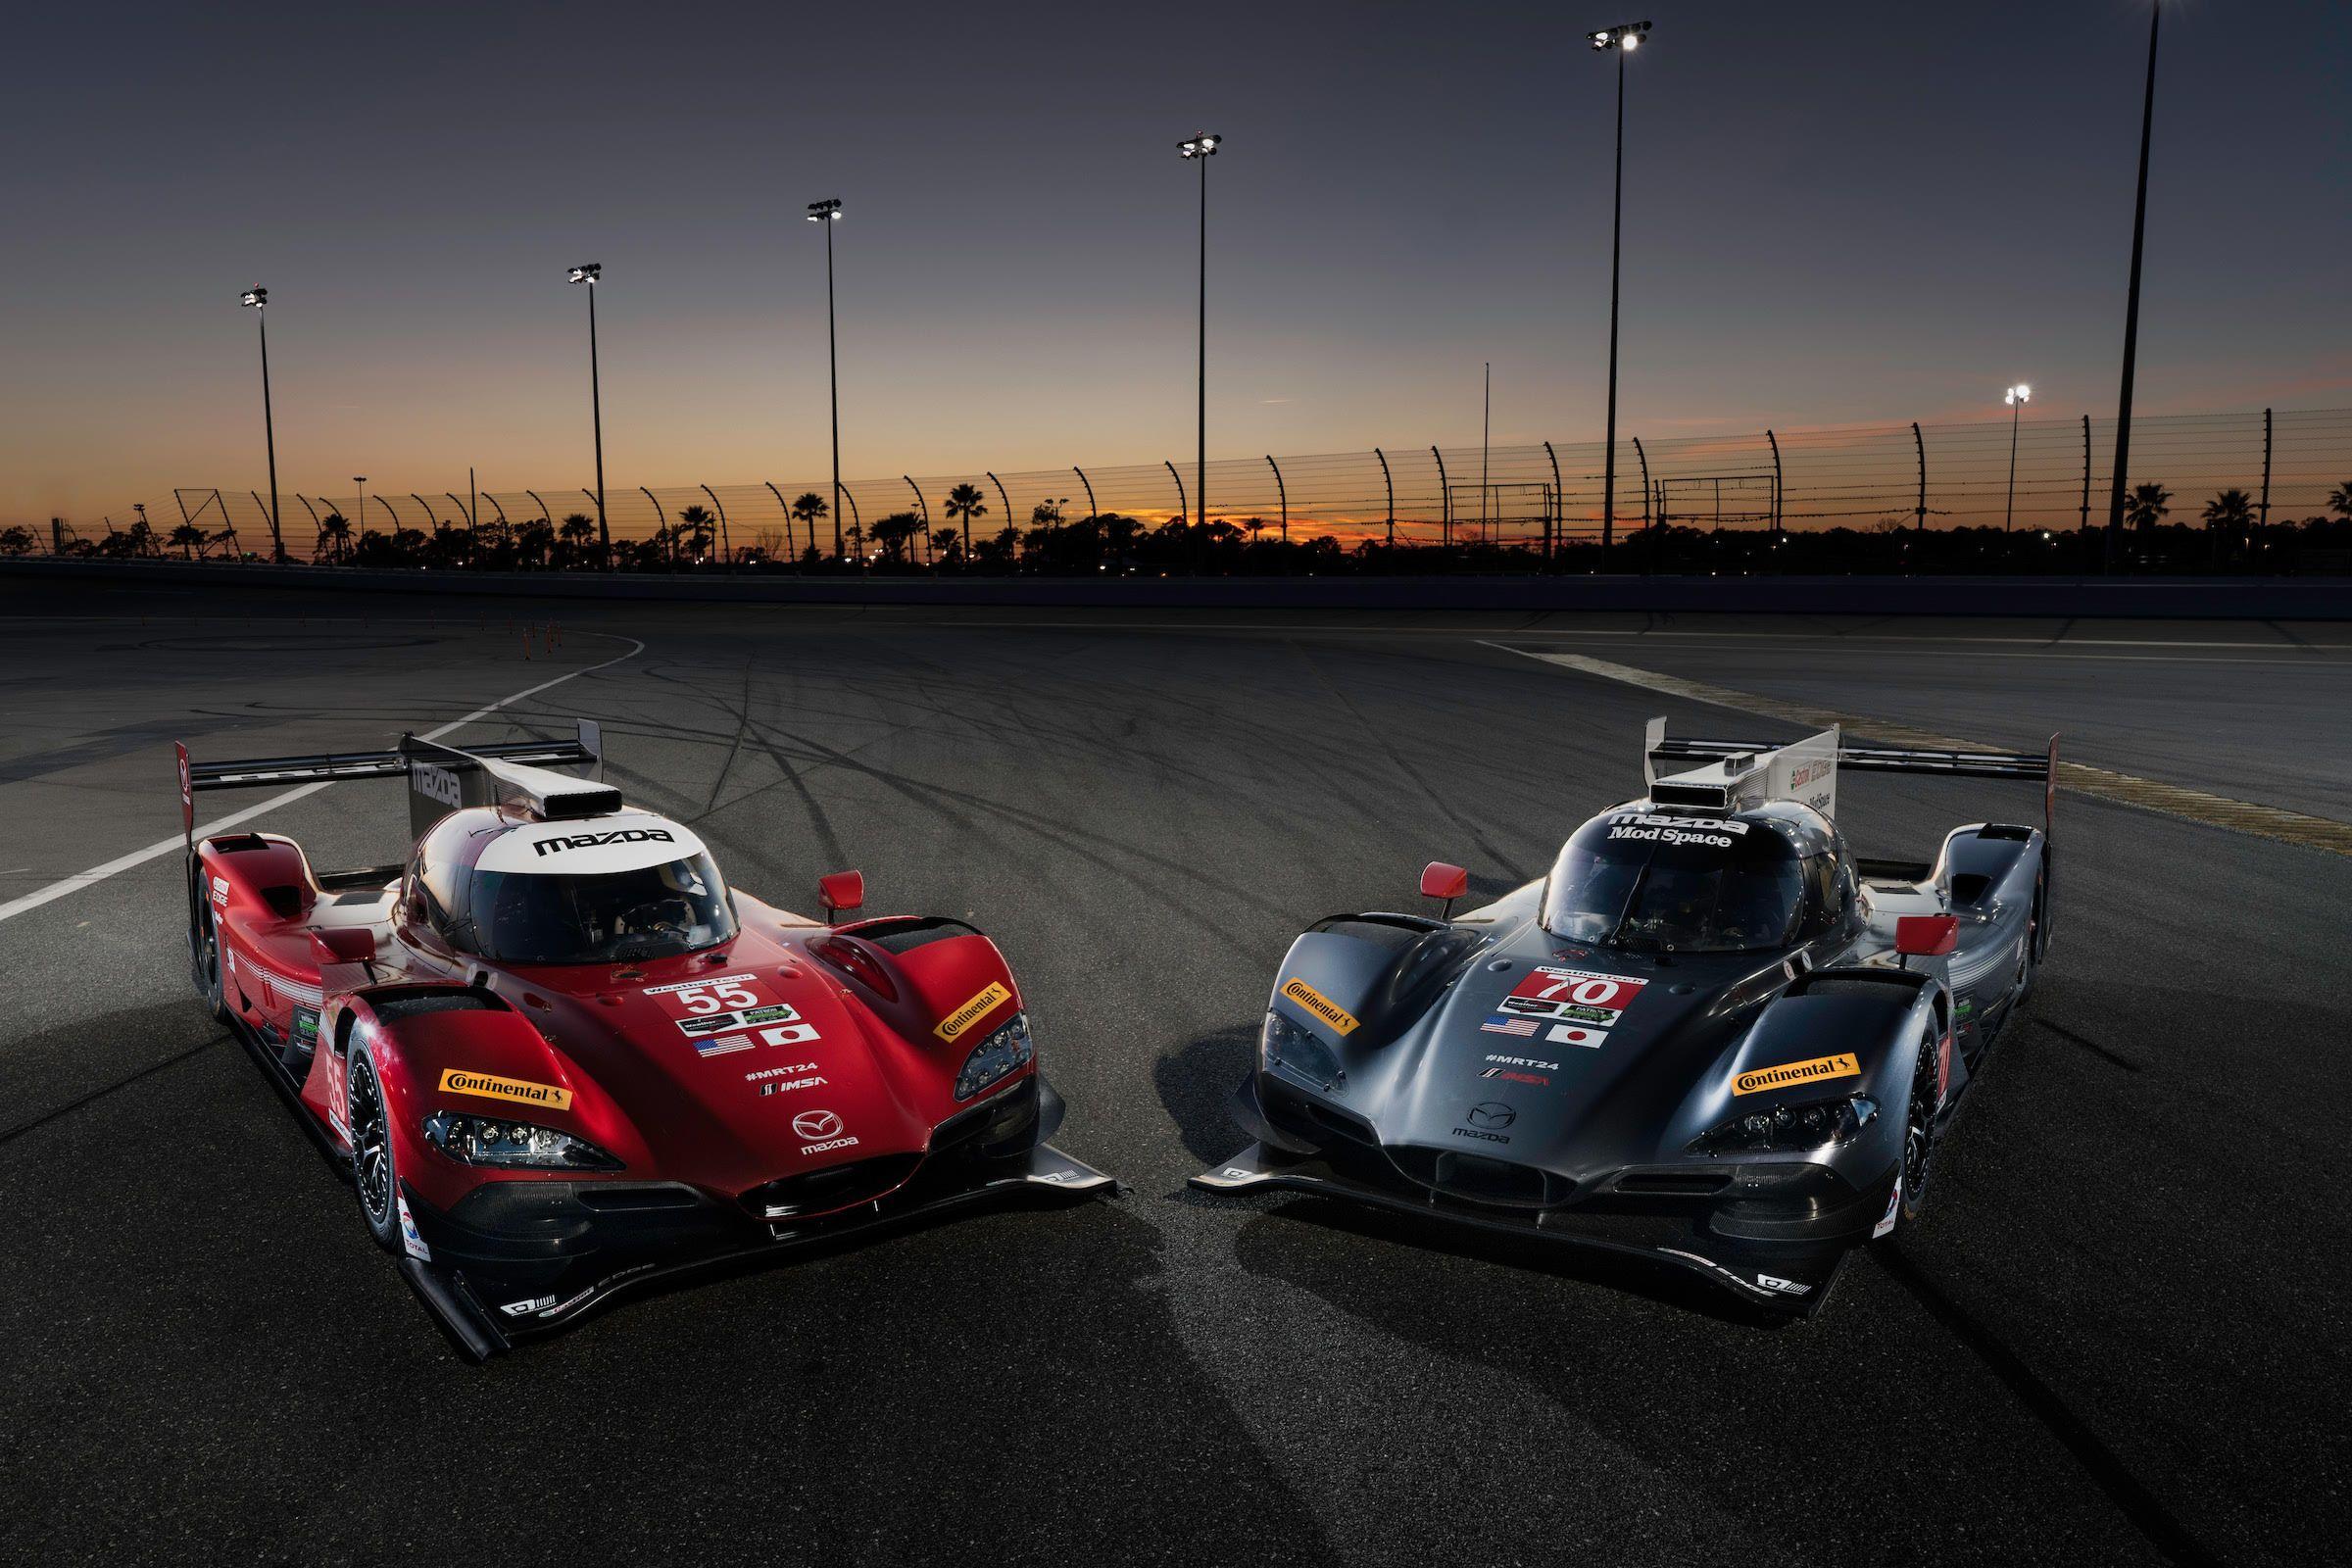 Motor 39 N Mazda Prototypes To Race Distinct Liveries In 2017 Racing Mazda Motorsport